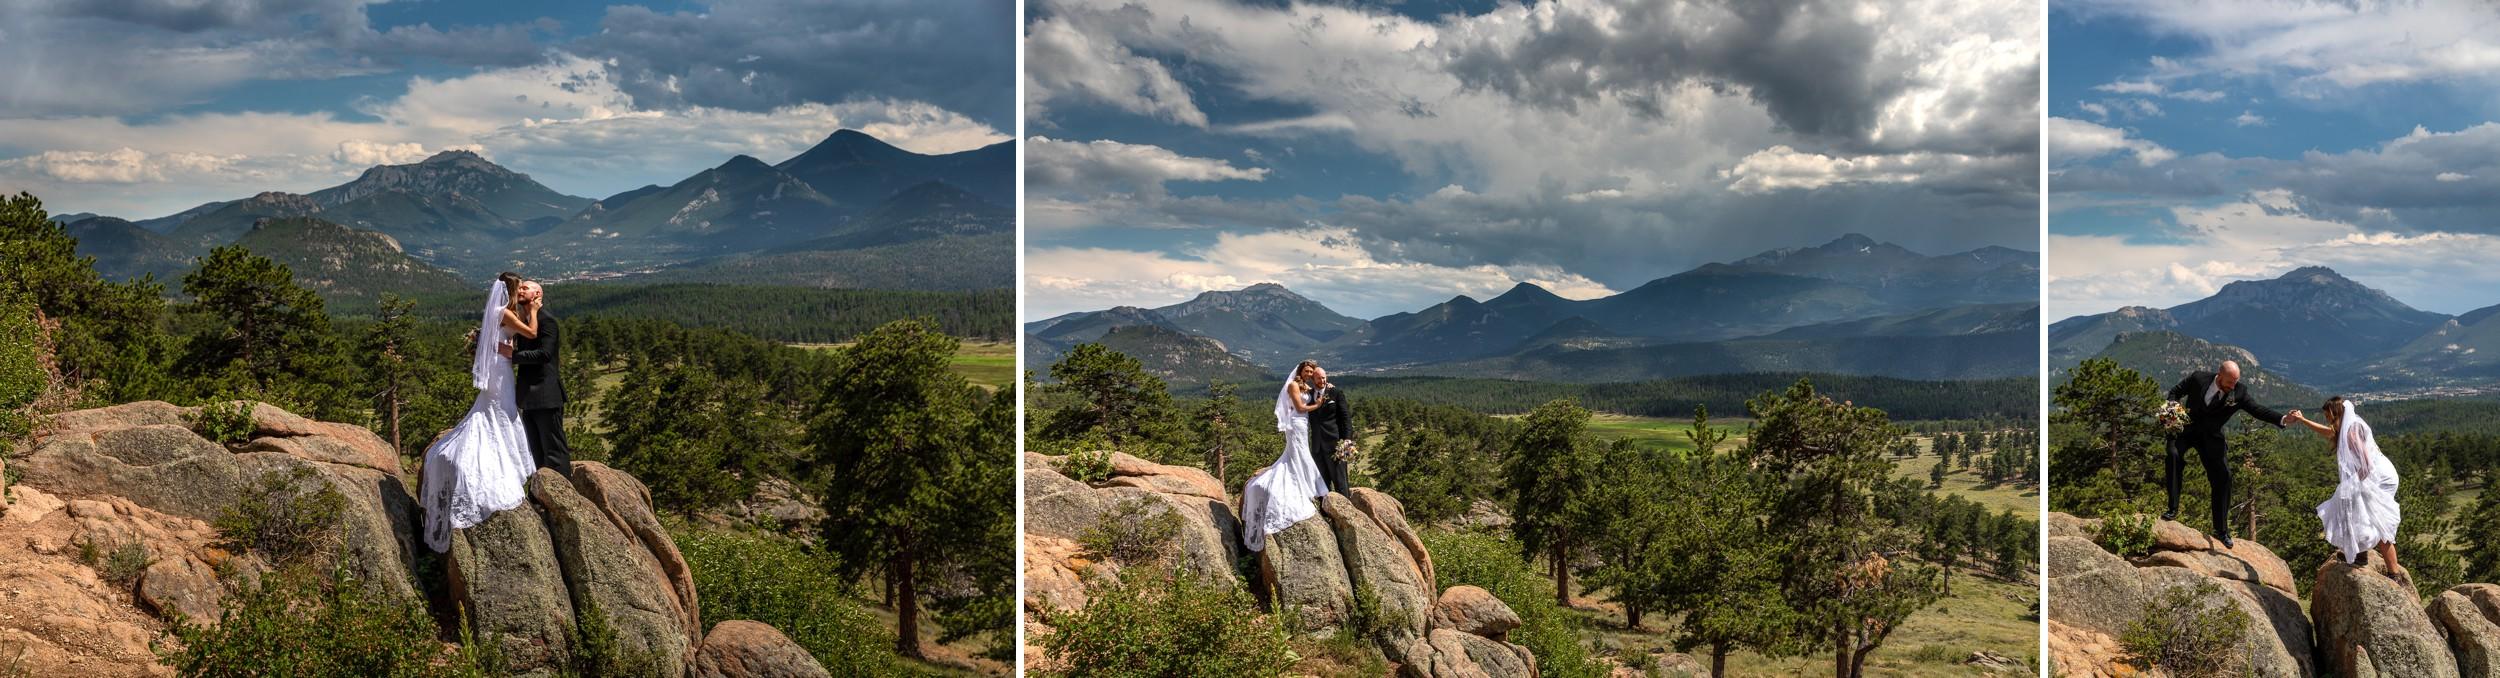 Rocky Mountain National Park Wedding Photographer